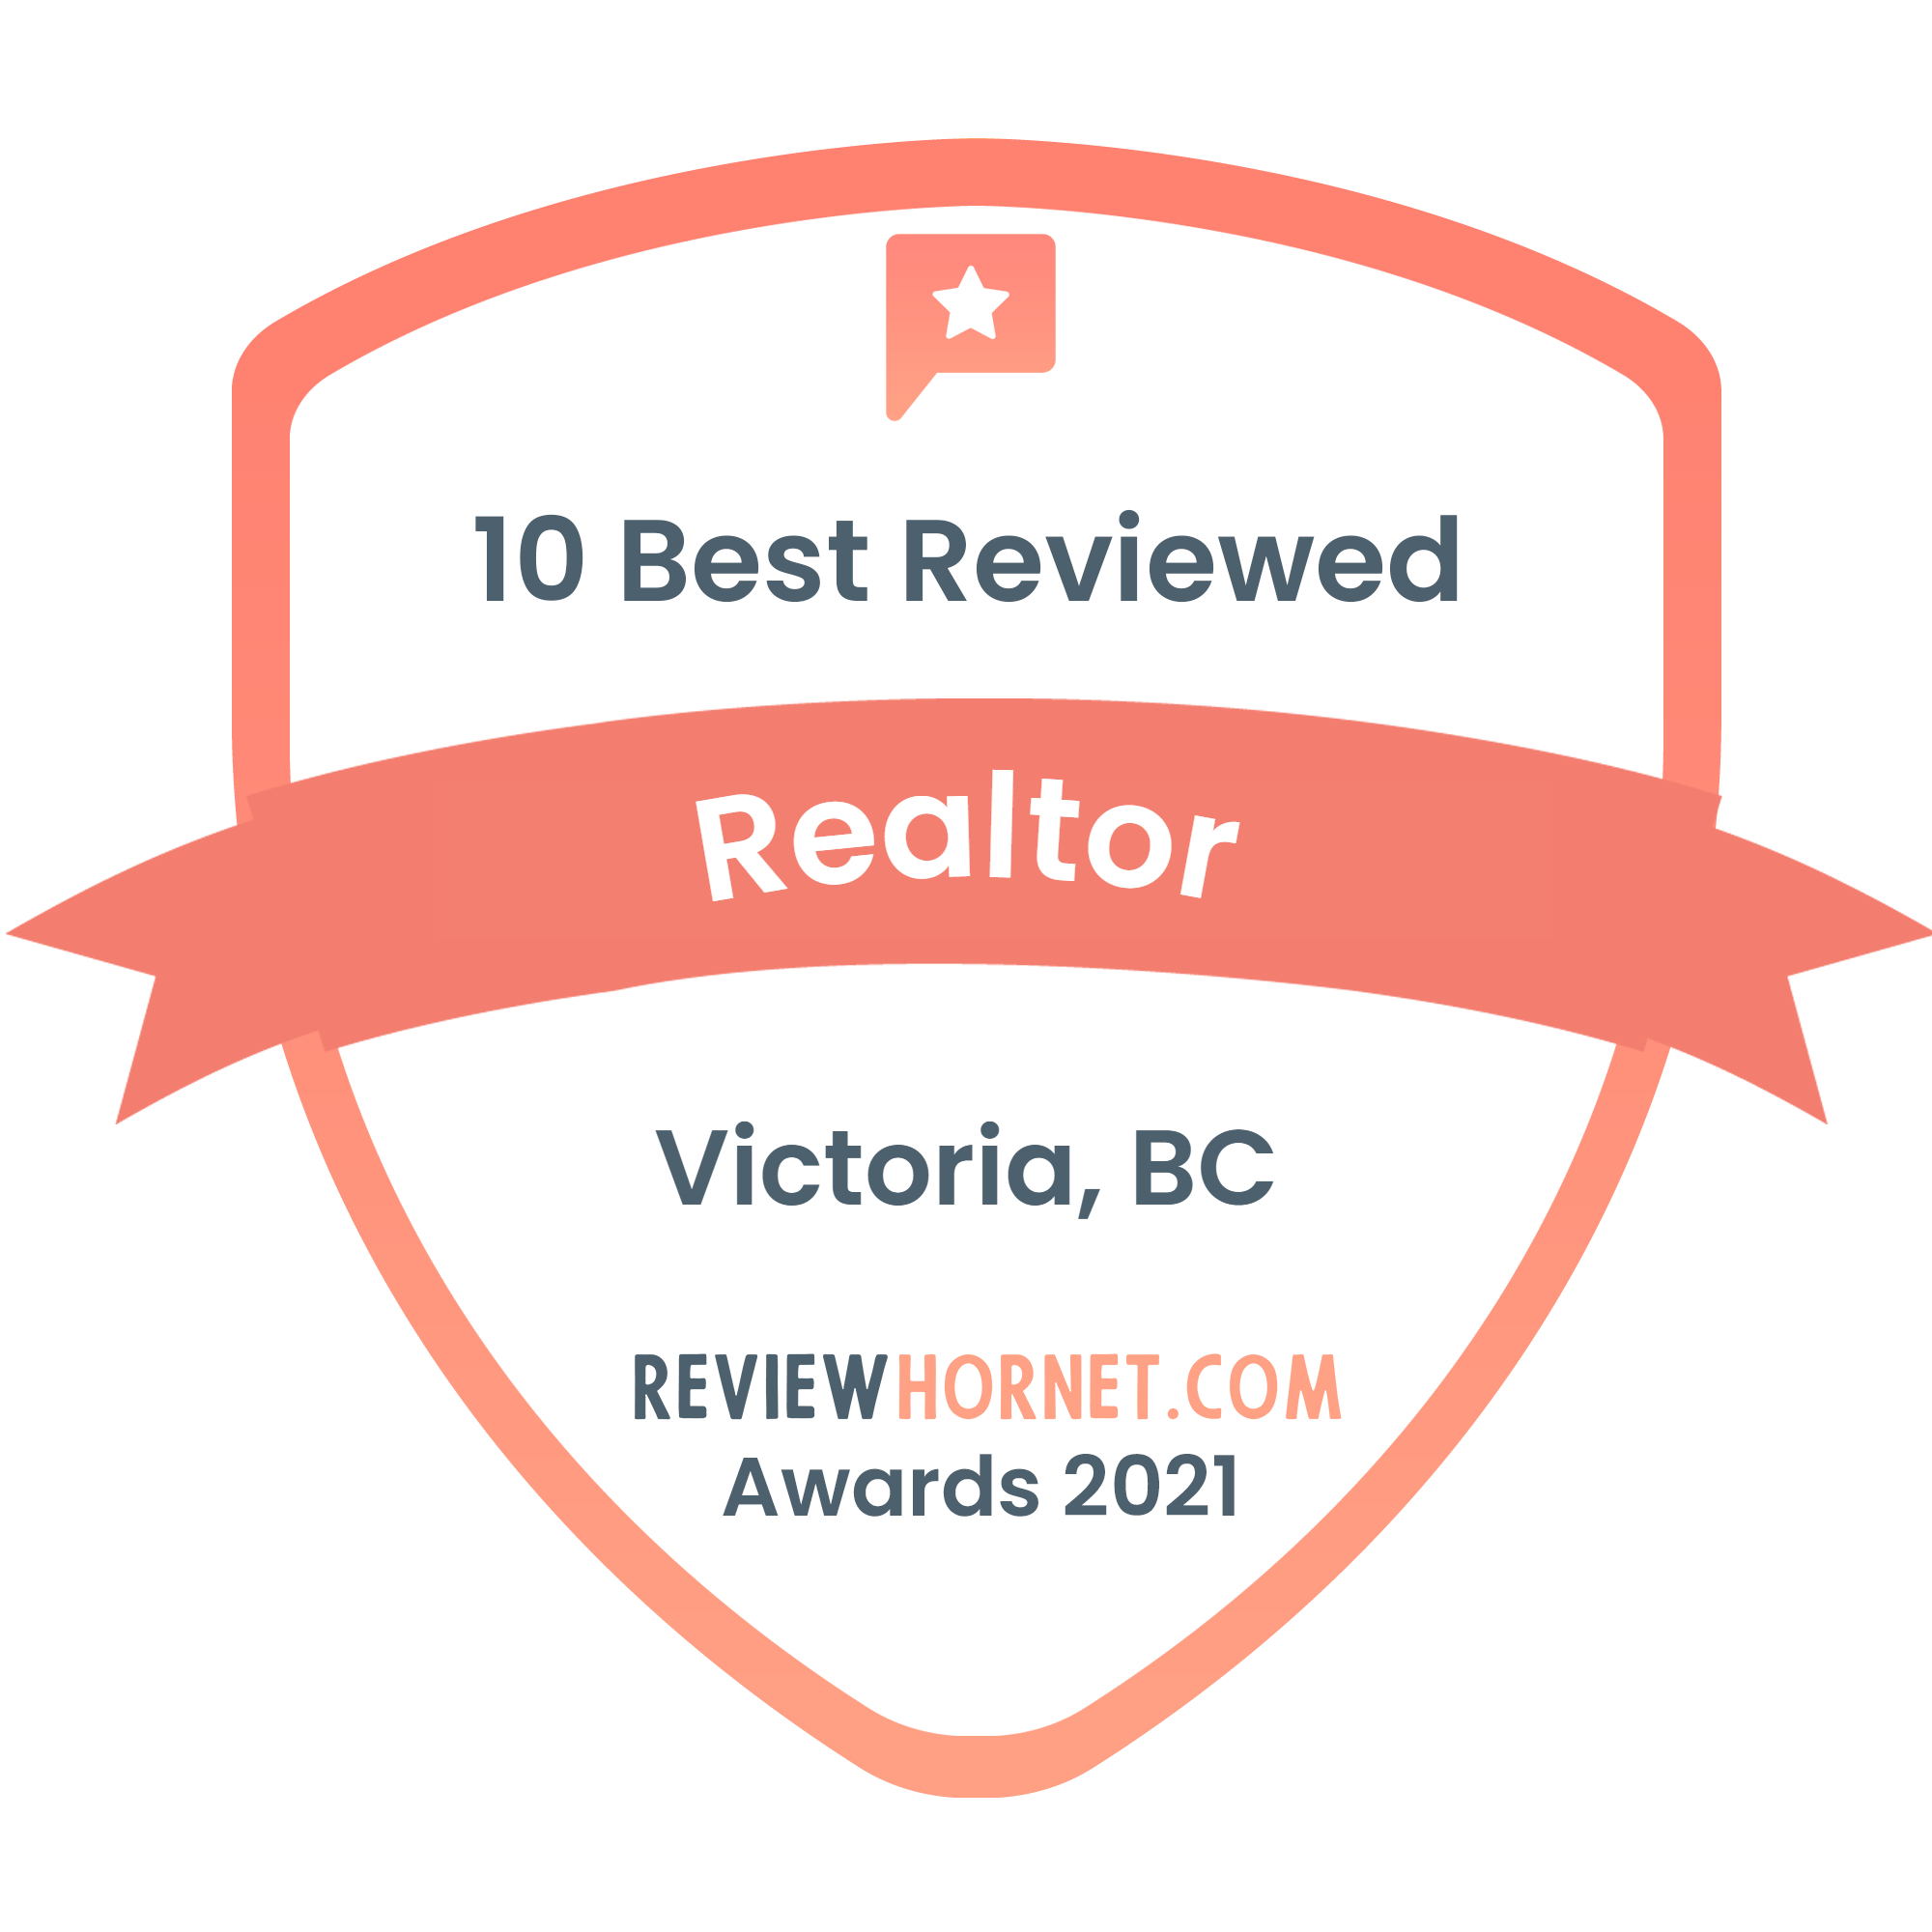 Victoria BC top rated realtor